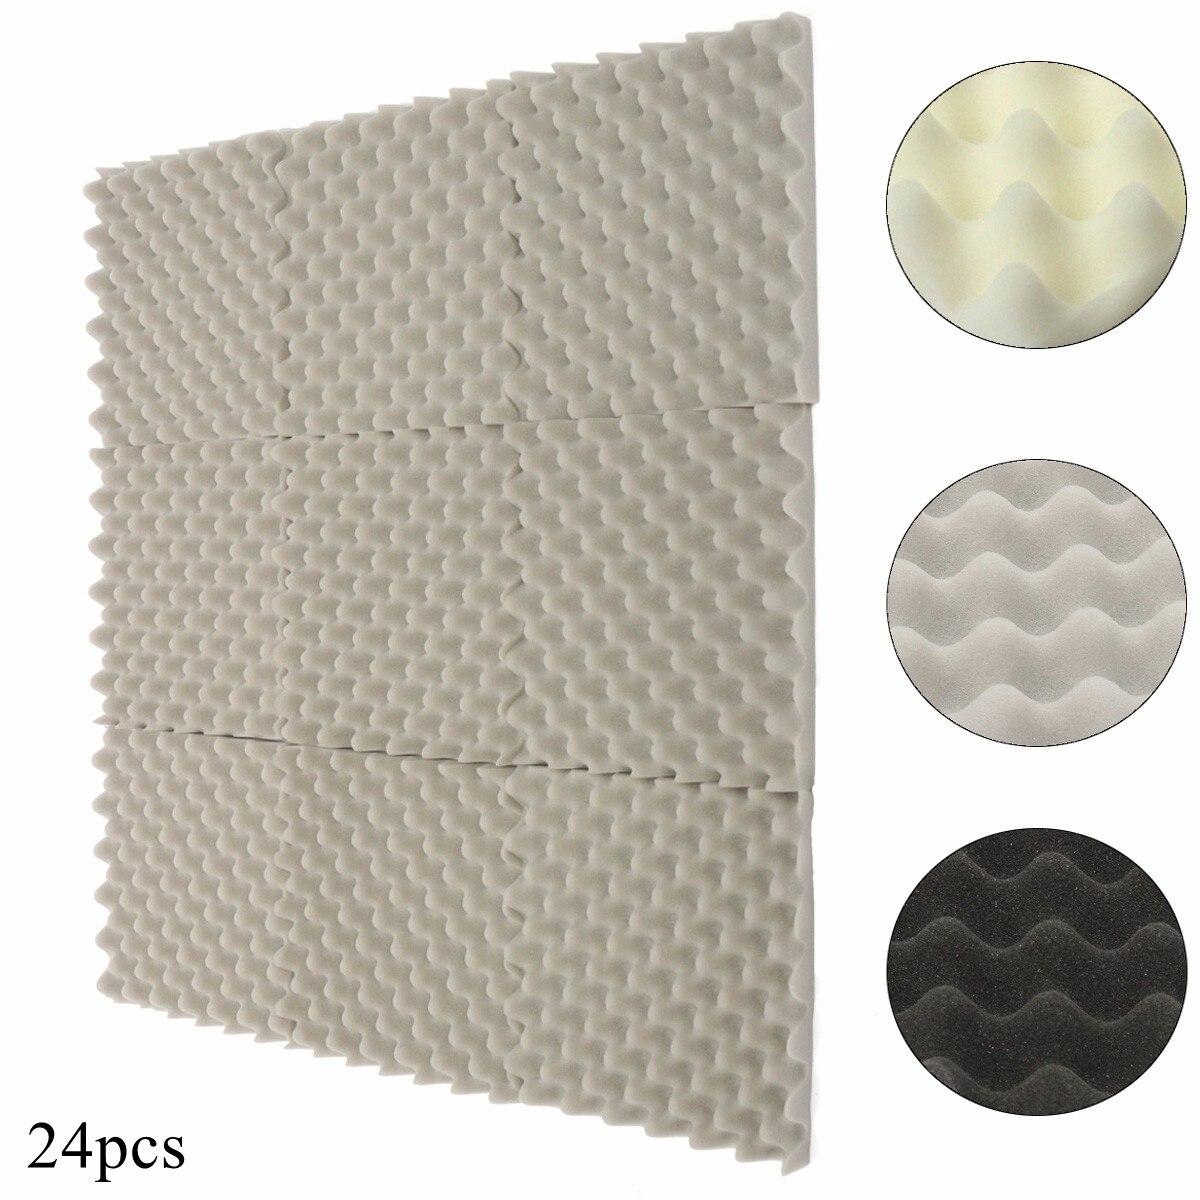 24Pcs 305x305x40mm Soundproofing Foam Acoustic Foam Sound Treatment Studio Room Absorption Wedge Tiles Polyurethane foam sound absorption coefficient analysis